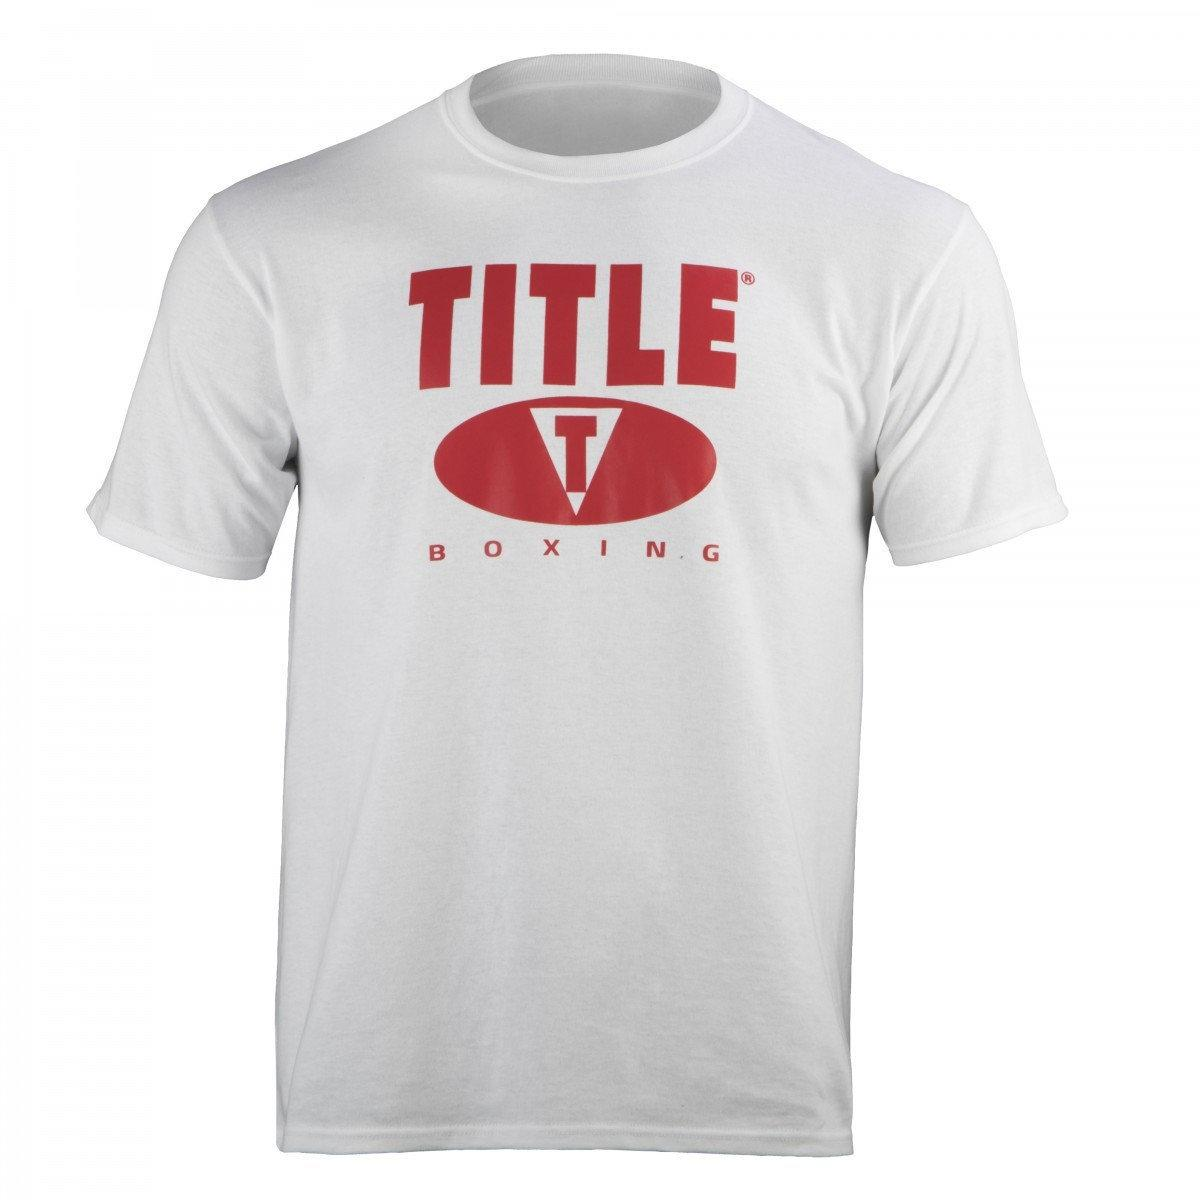 Title Уценка! Футболка Title Boxing '98 Retro Tee